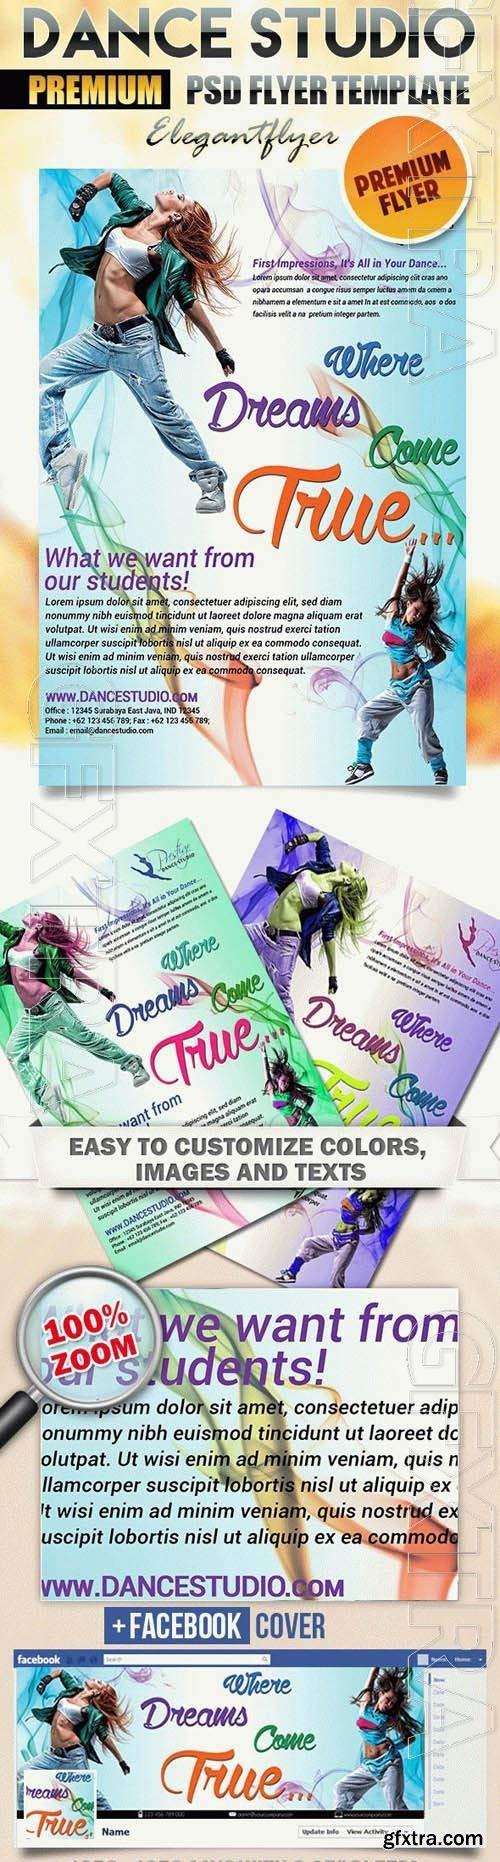 Dance Studio Flyer PSD Template